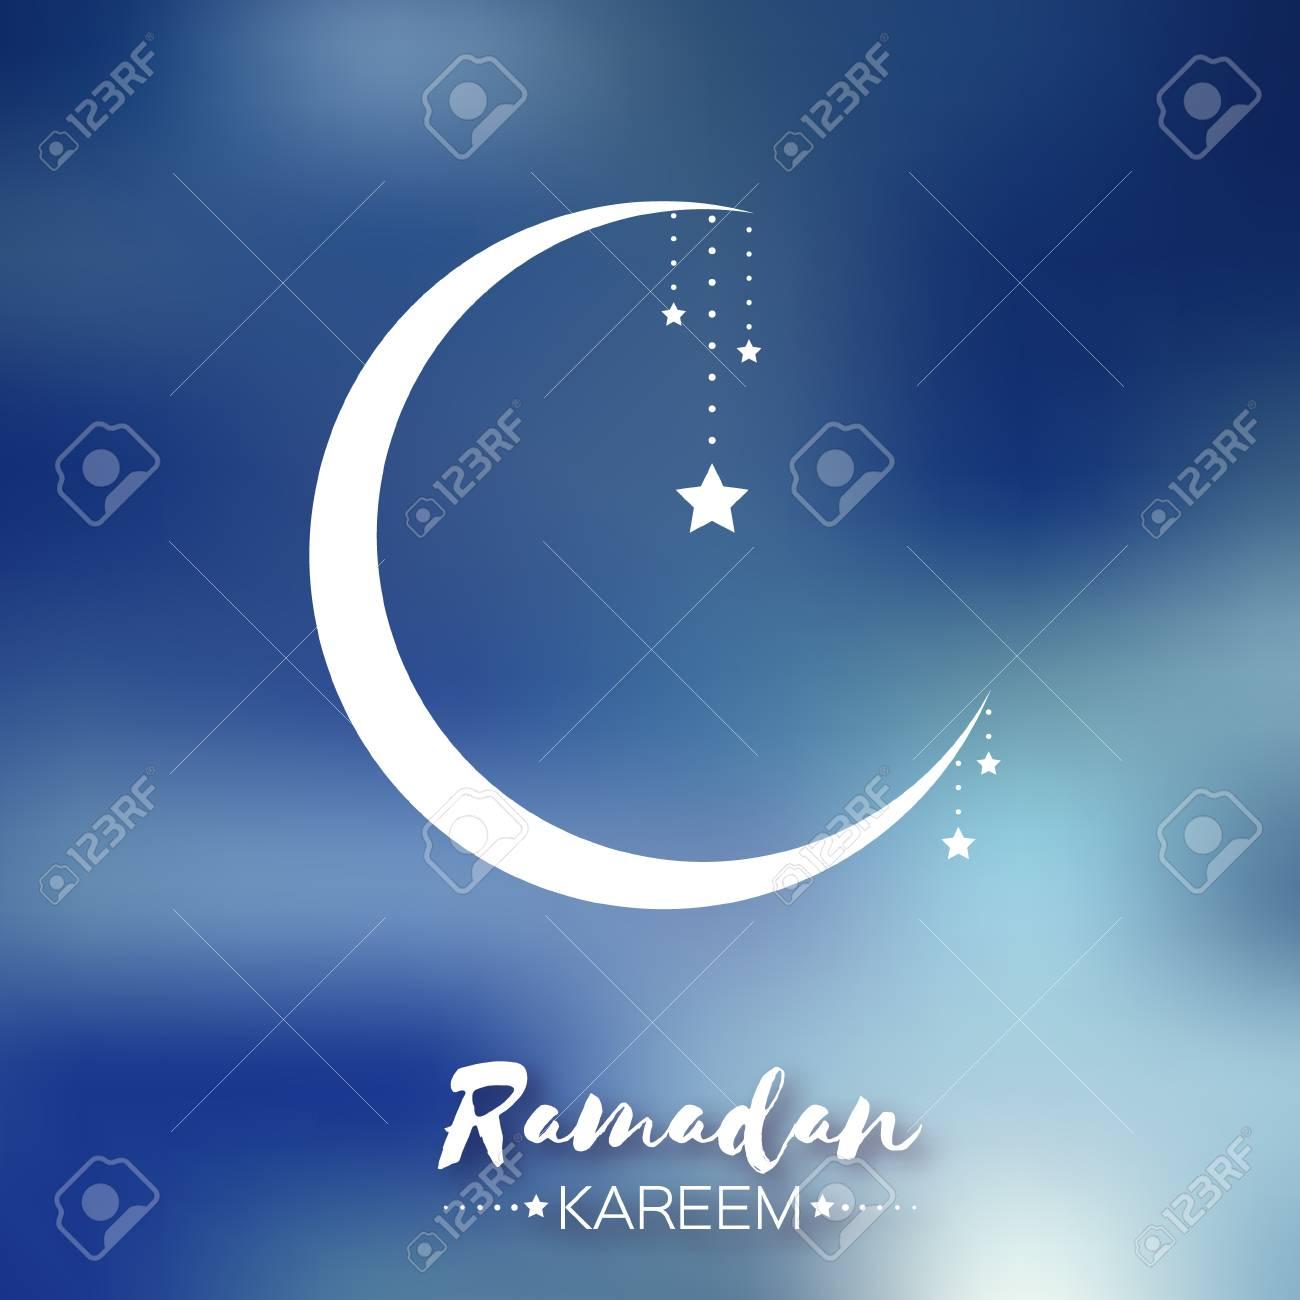 Blue Ramadan Kareem Celebration Greeting Card Stars And Crescent